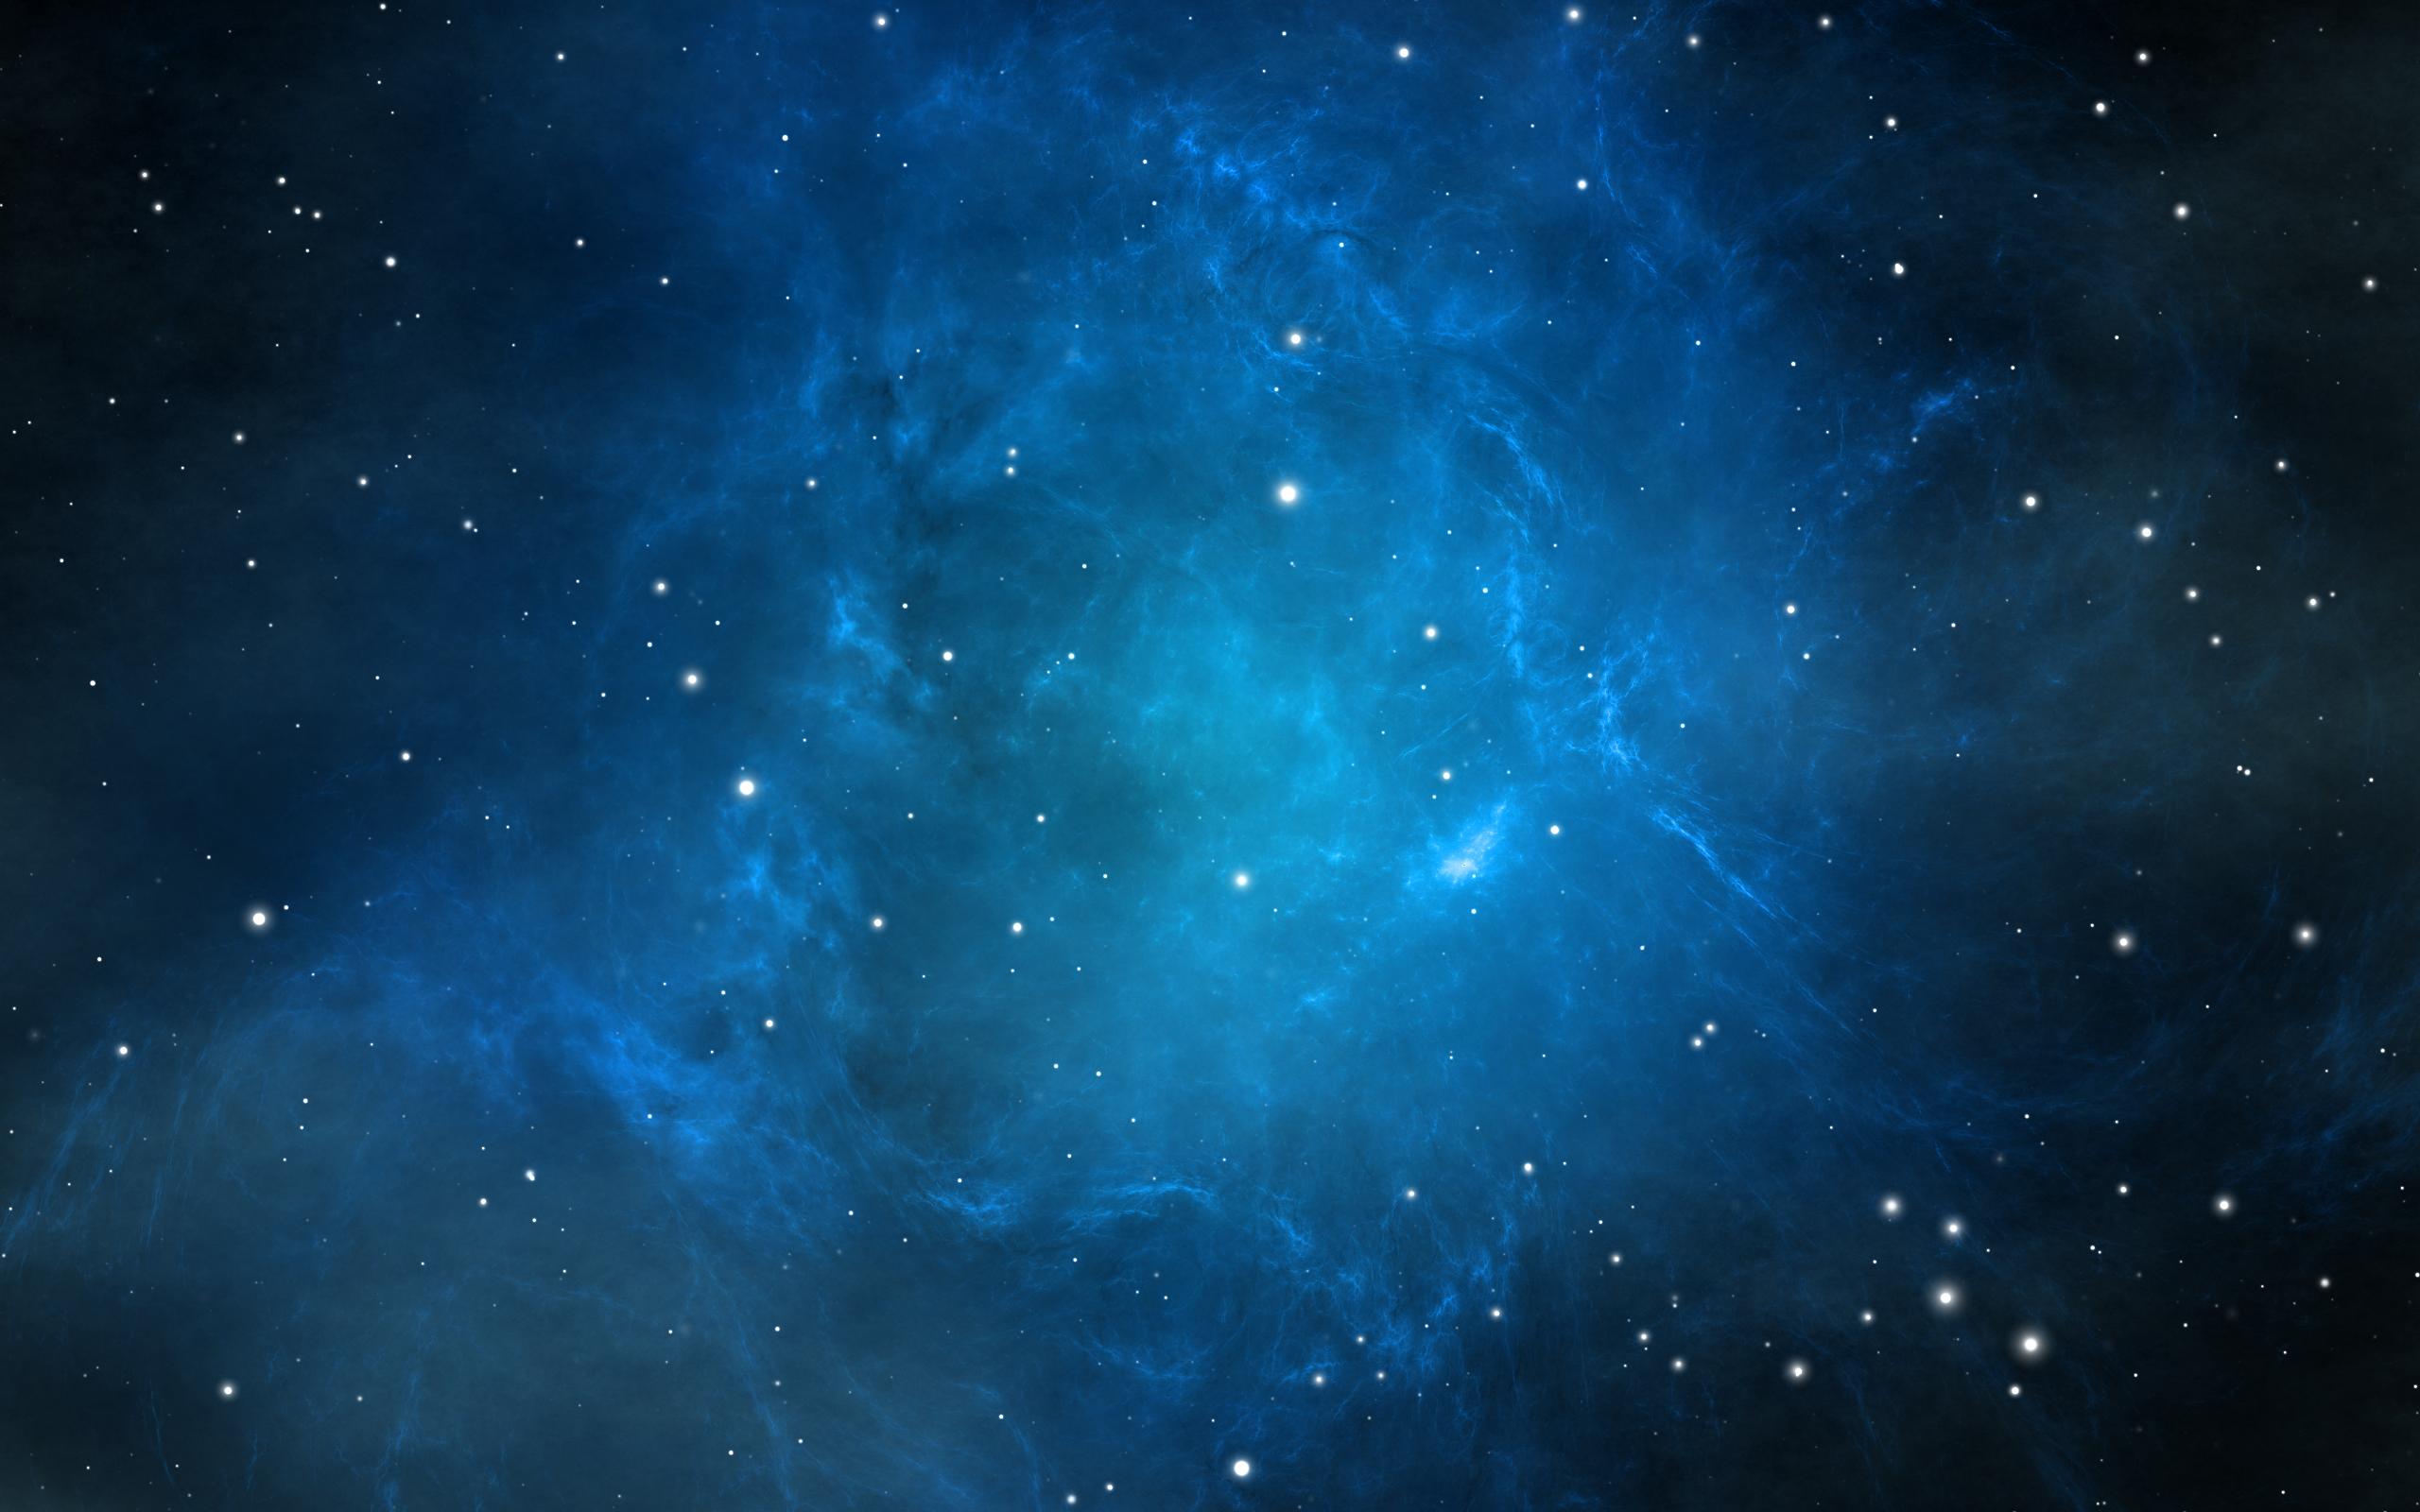 Blue Nebula Wallpaper - WallpaperSafari